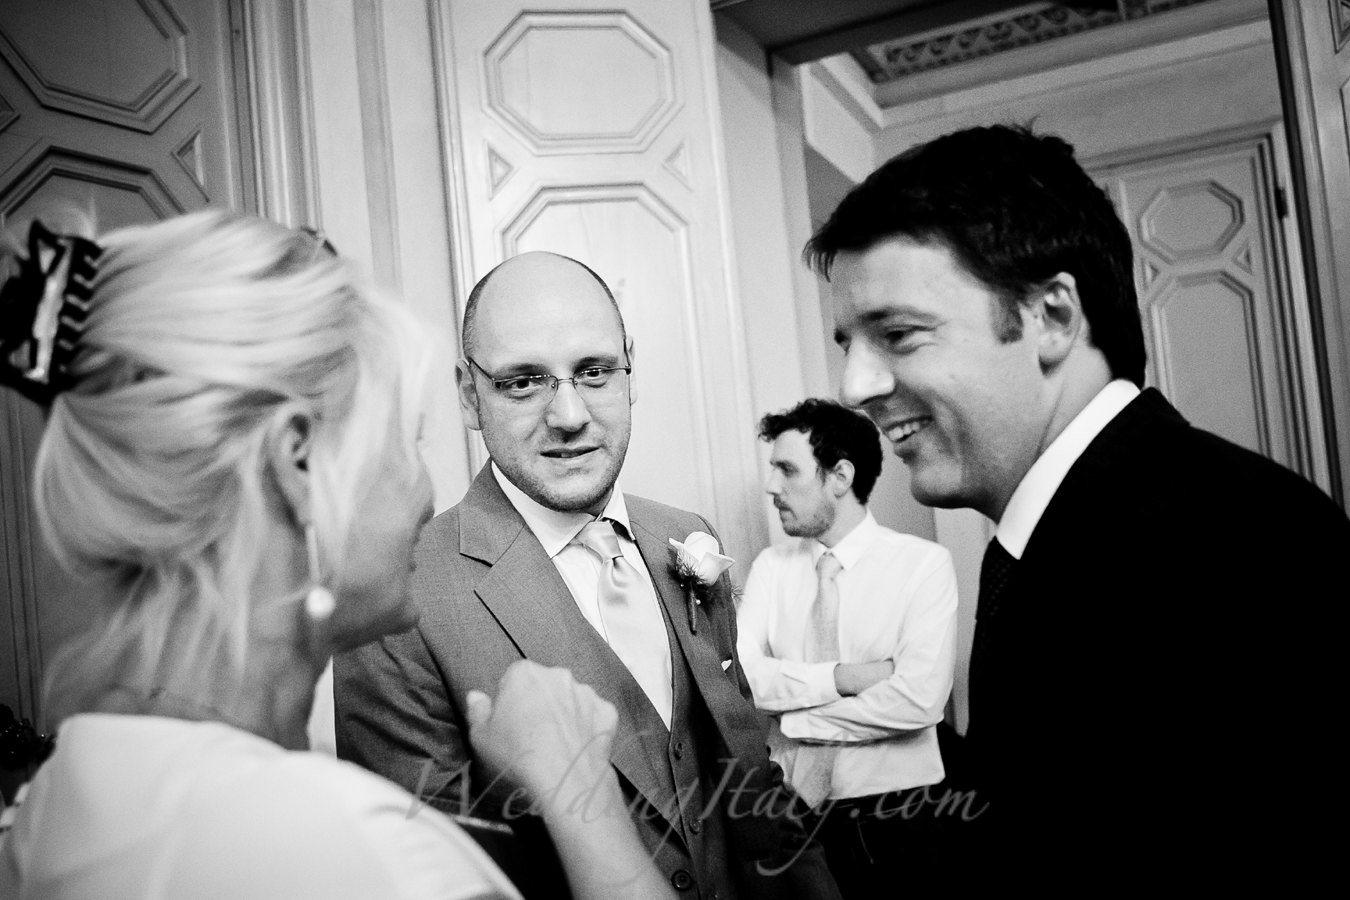 Prime minister Renzi and Helga